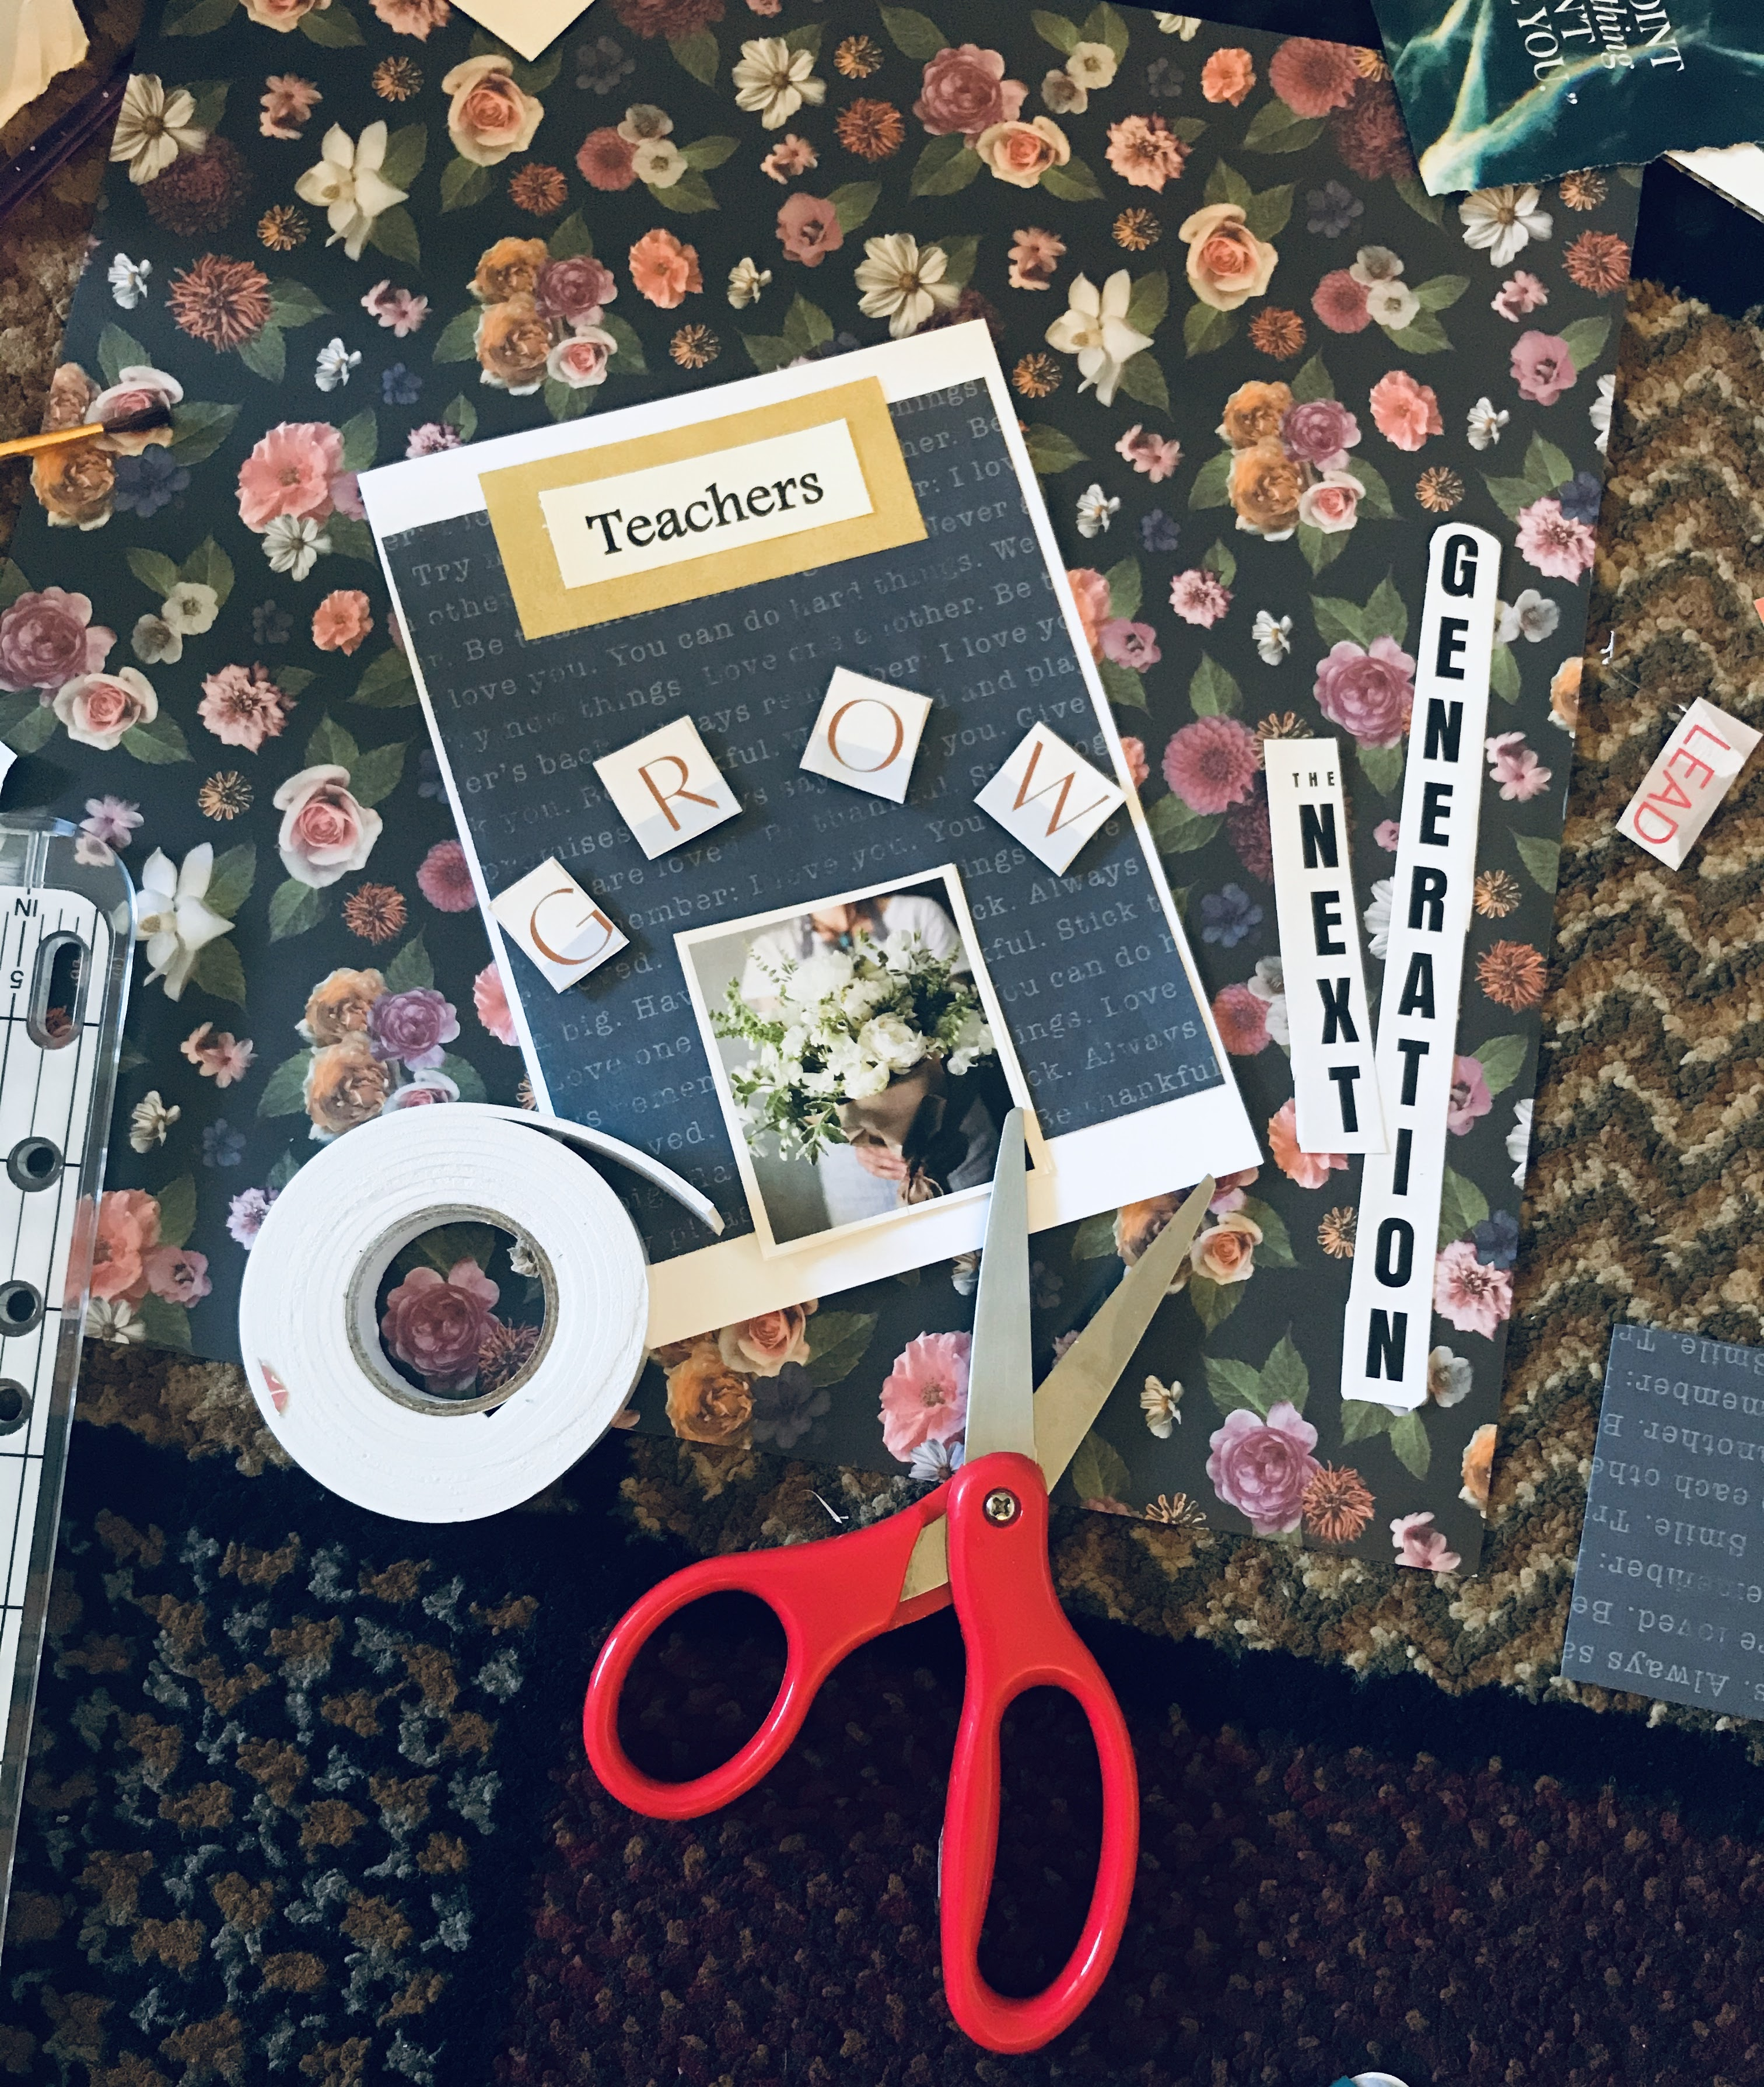 Homemade using upcycled magazines, glue, scissors and foam tape.